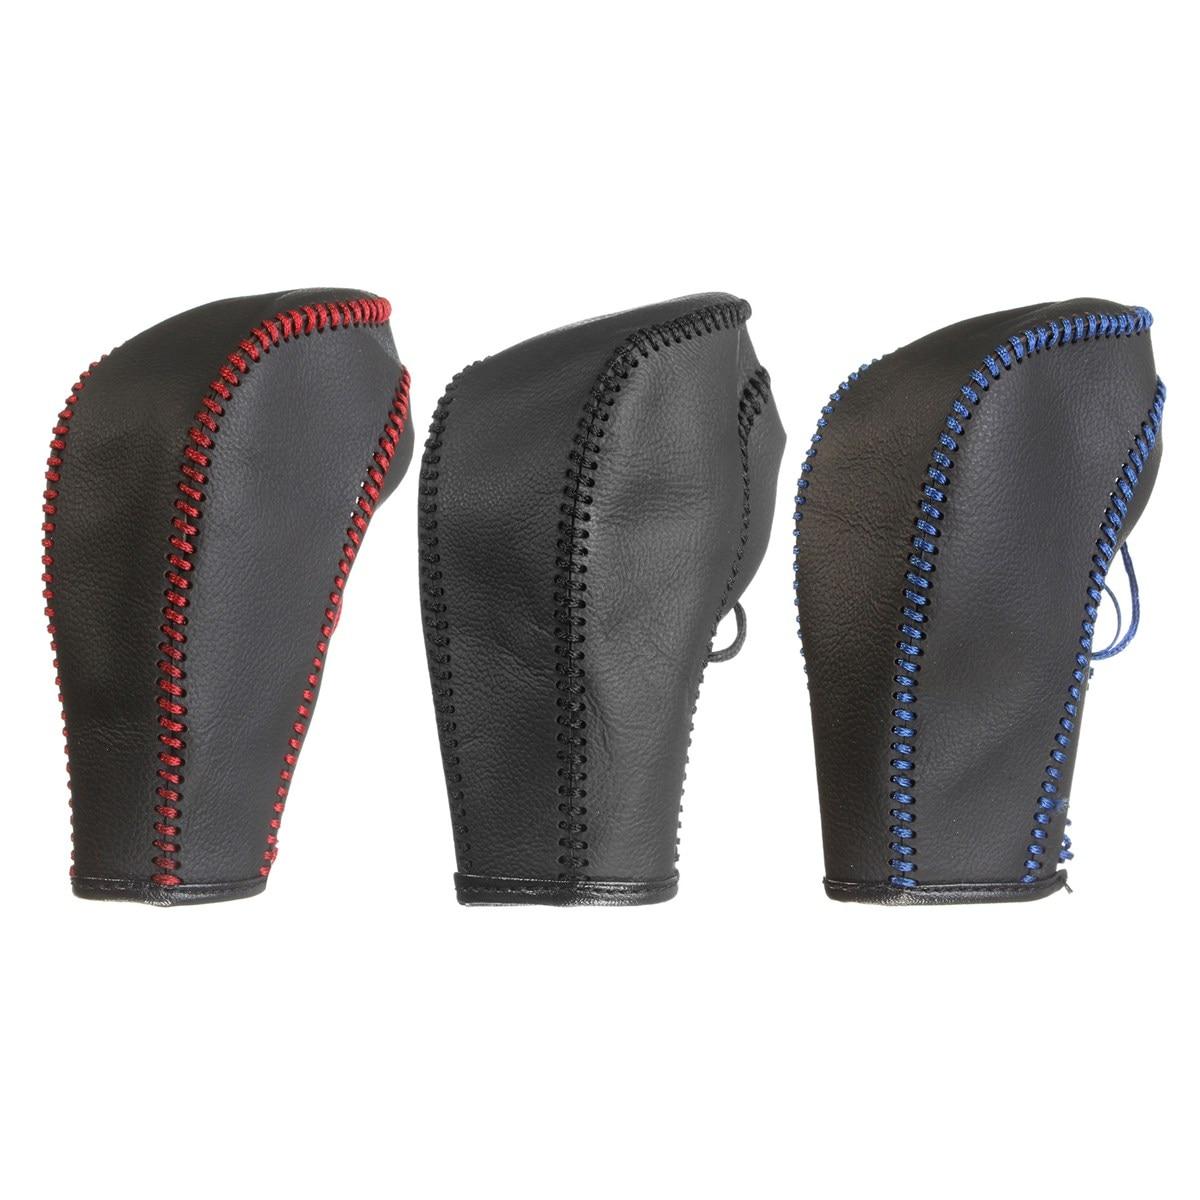 Gear-Shift-Knob-Cover Captiva Chevrolet/cruze Automatic Transmission-Hand-Stitched